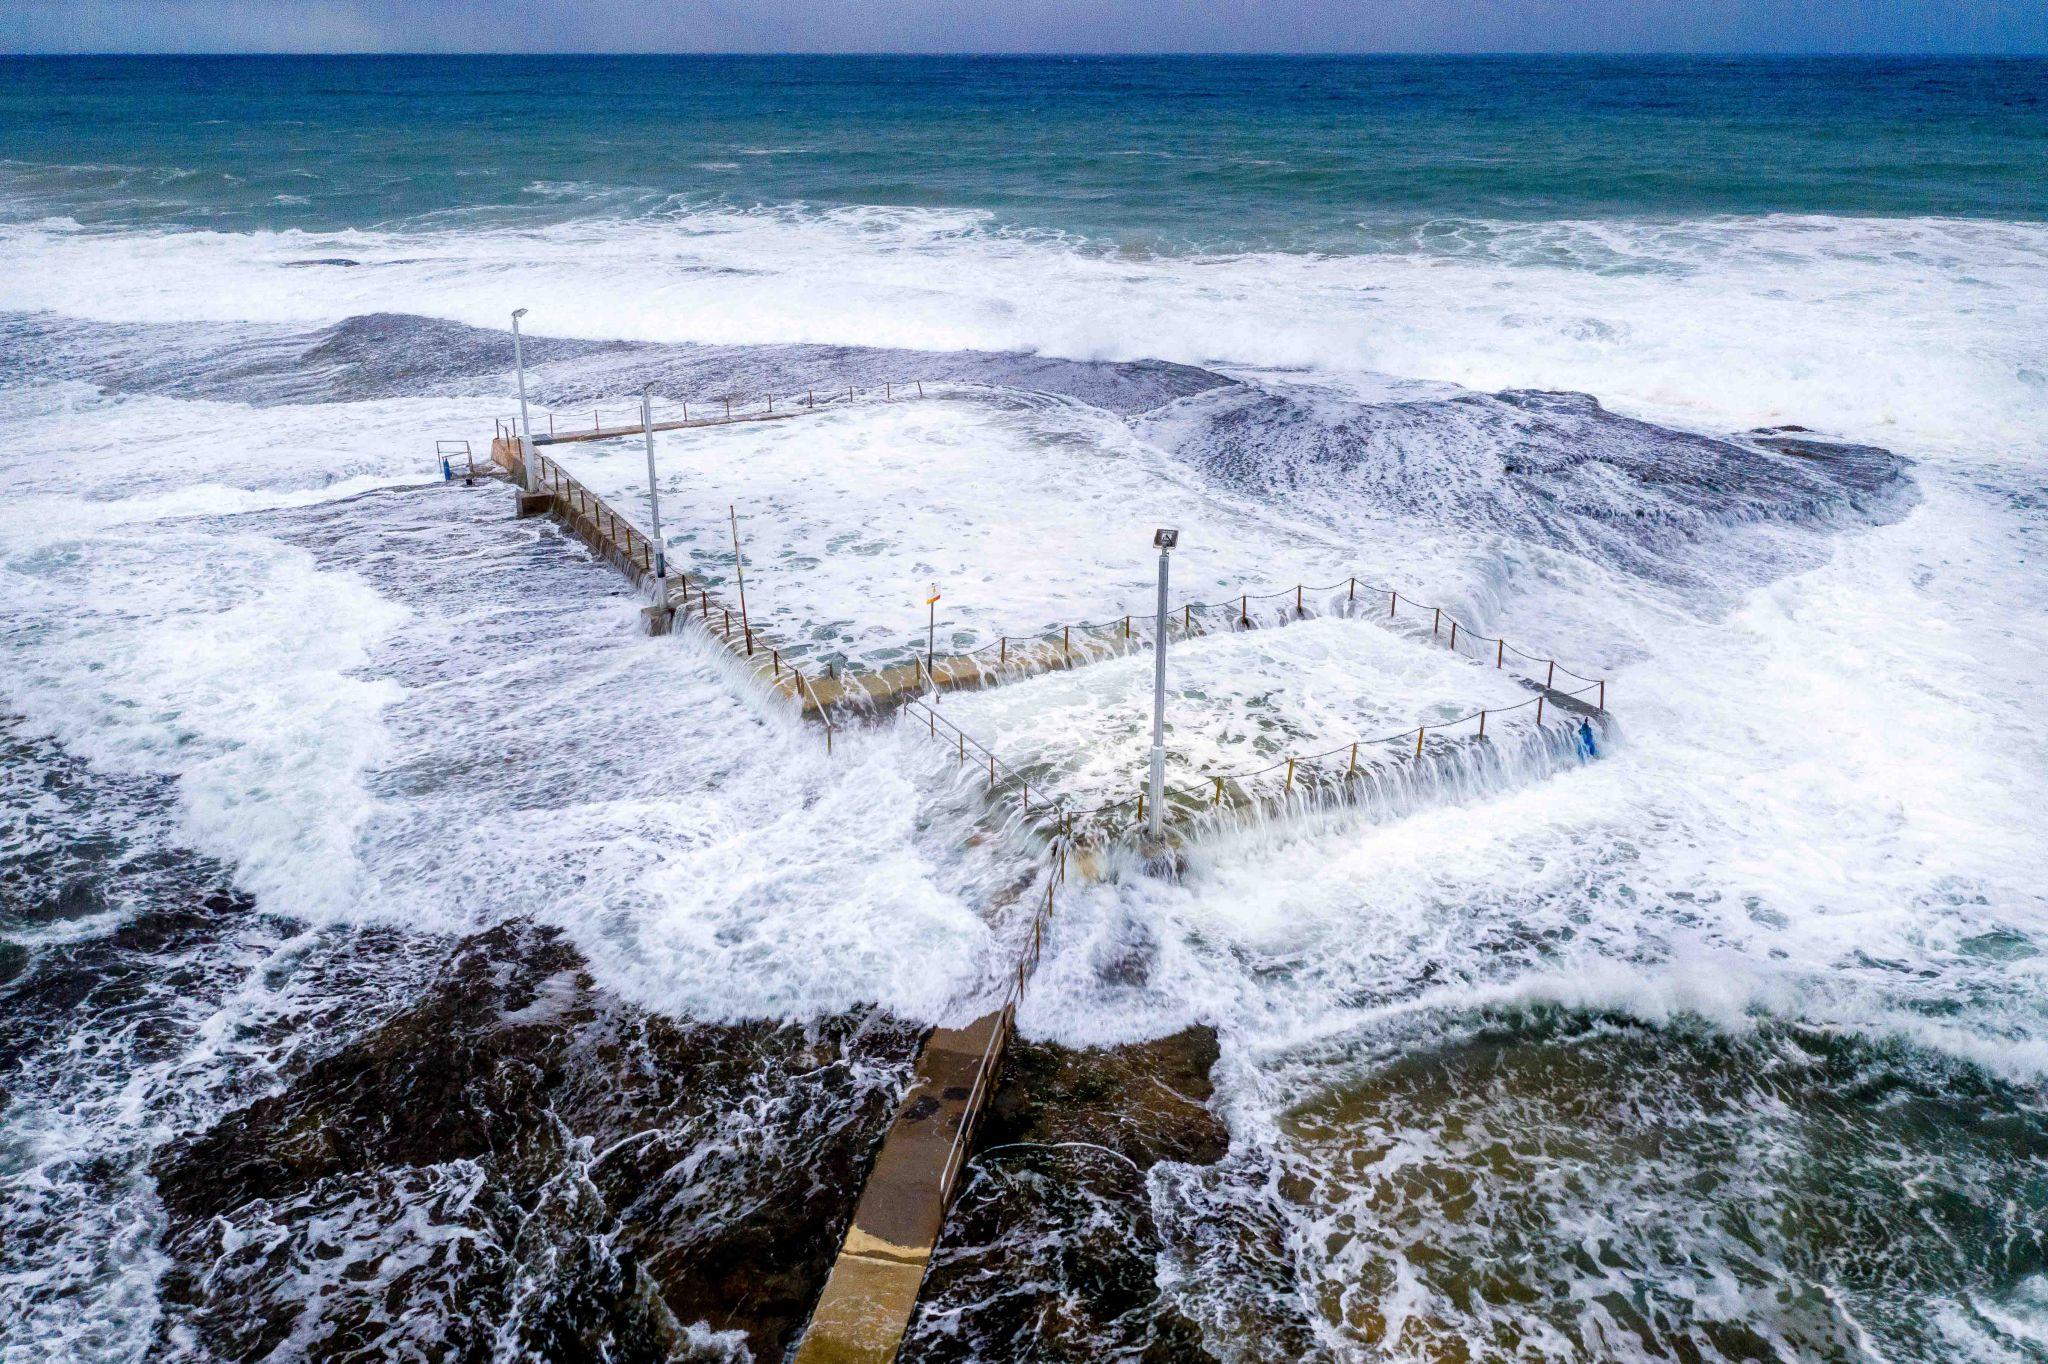 Mona Vale Pool big surf, Northern Beaches NSW, Australia